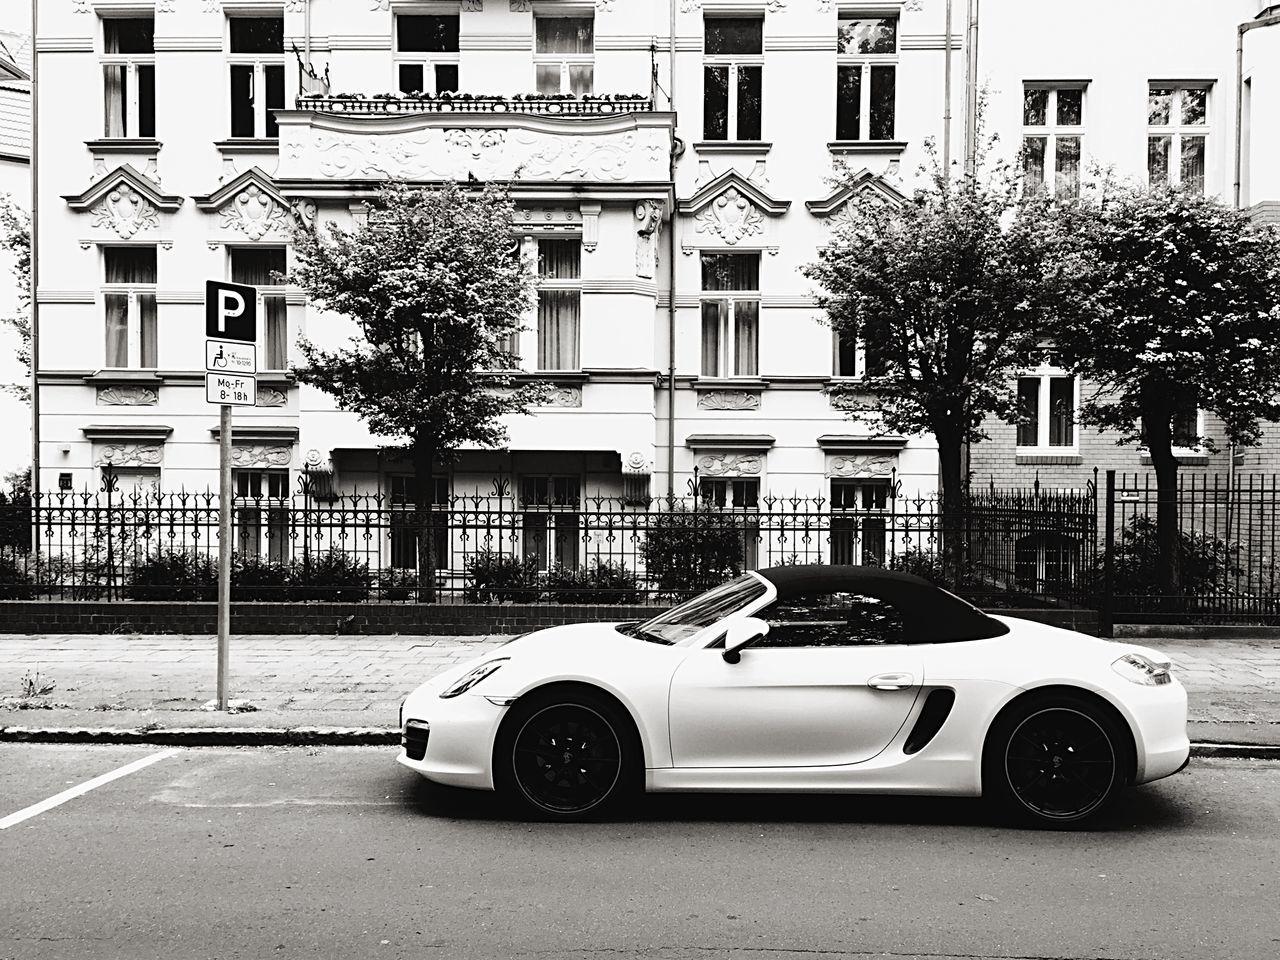 Mp-photowalk  Sunday Car Pic Mpro Blackandwhite Open Edit Streetphotography Mobilephotography.de